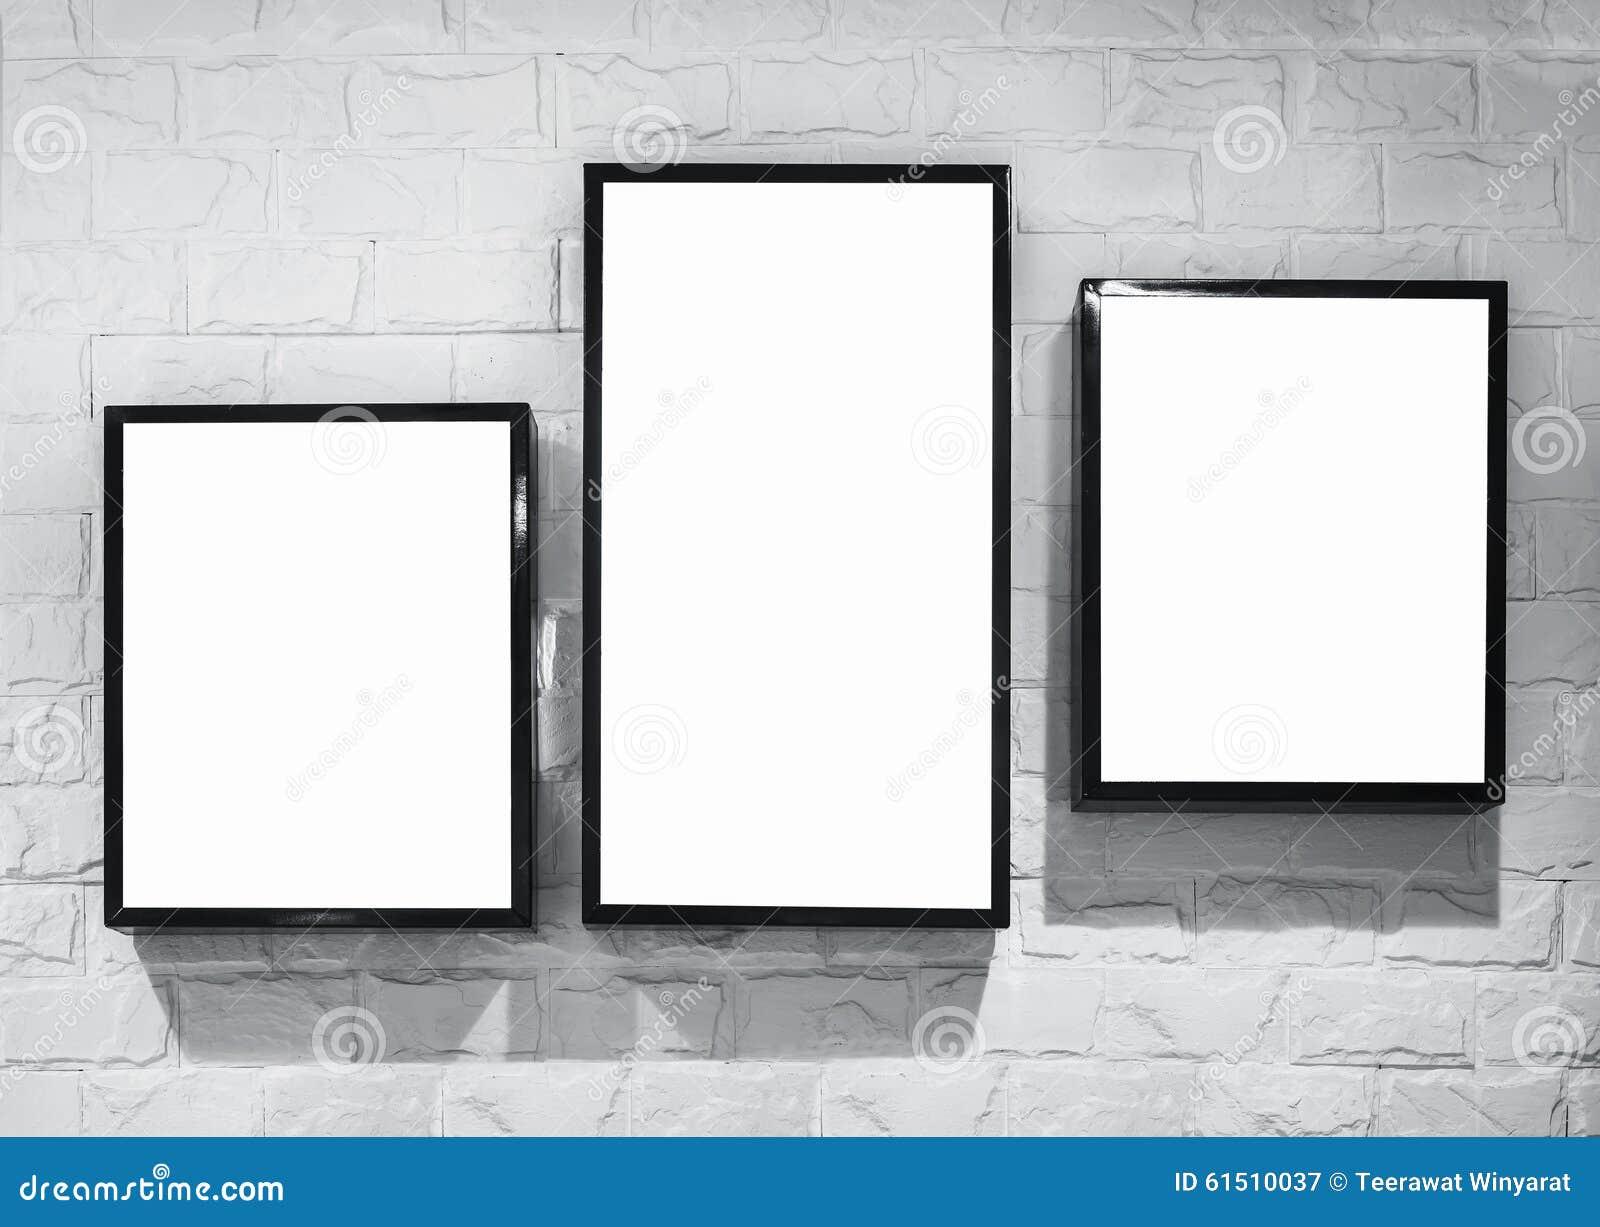 Mock Up Light Box Frame Deisgn On White Brick Wall Stock